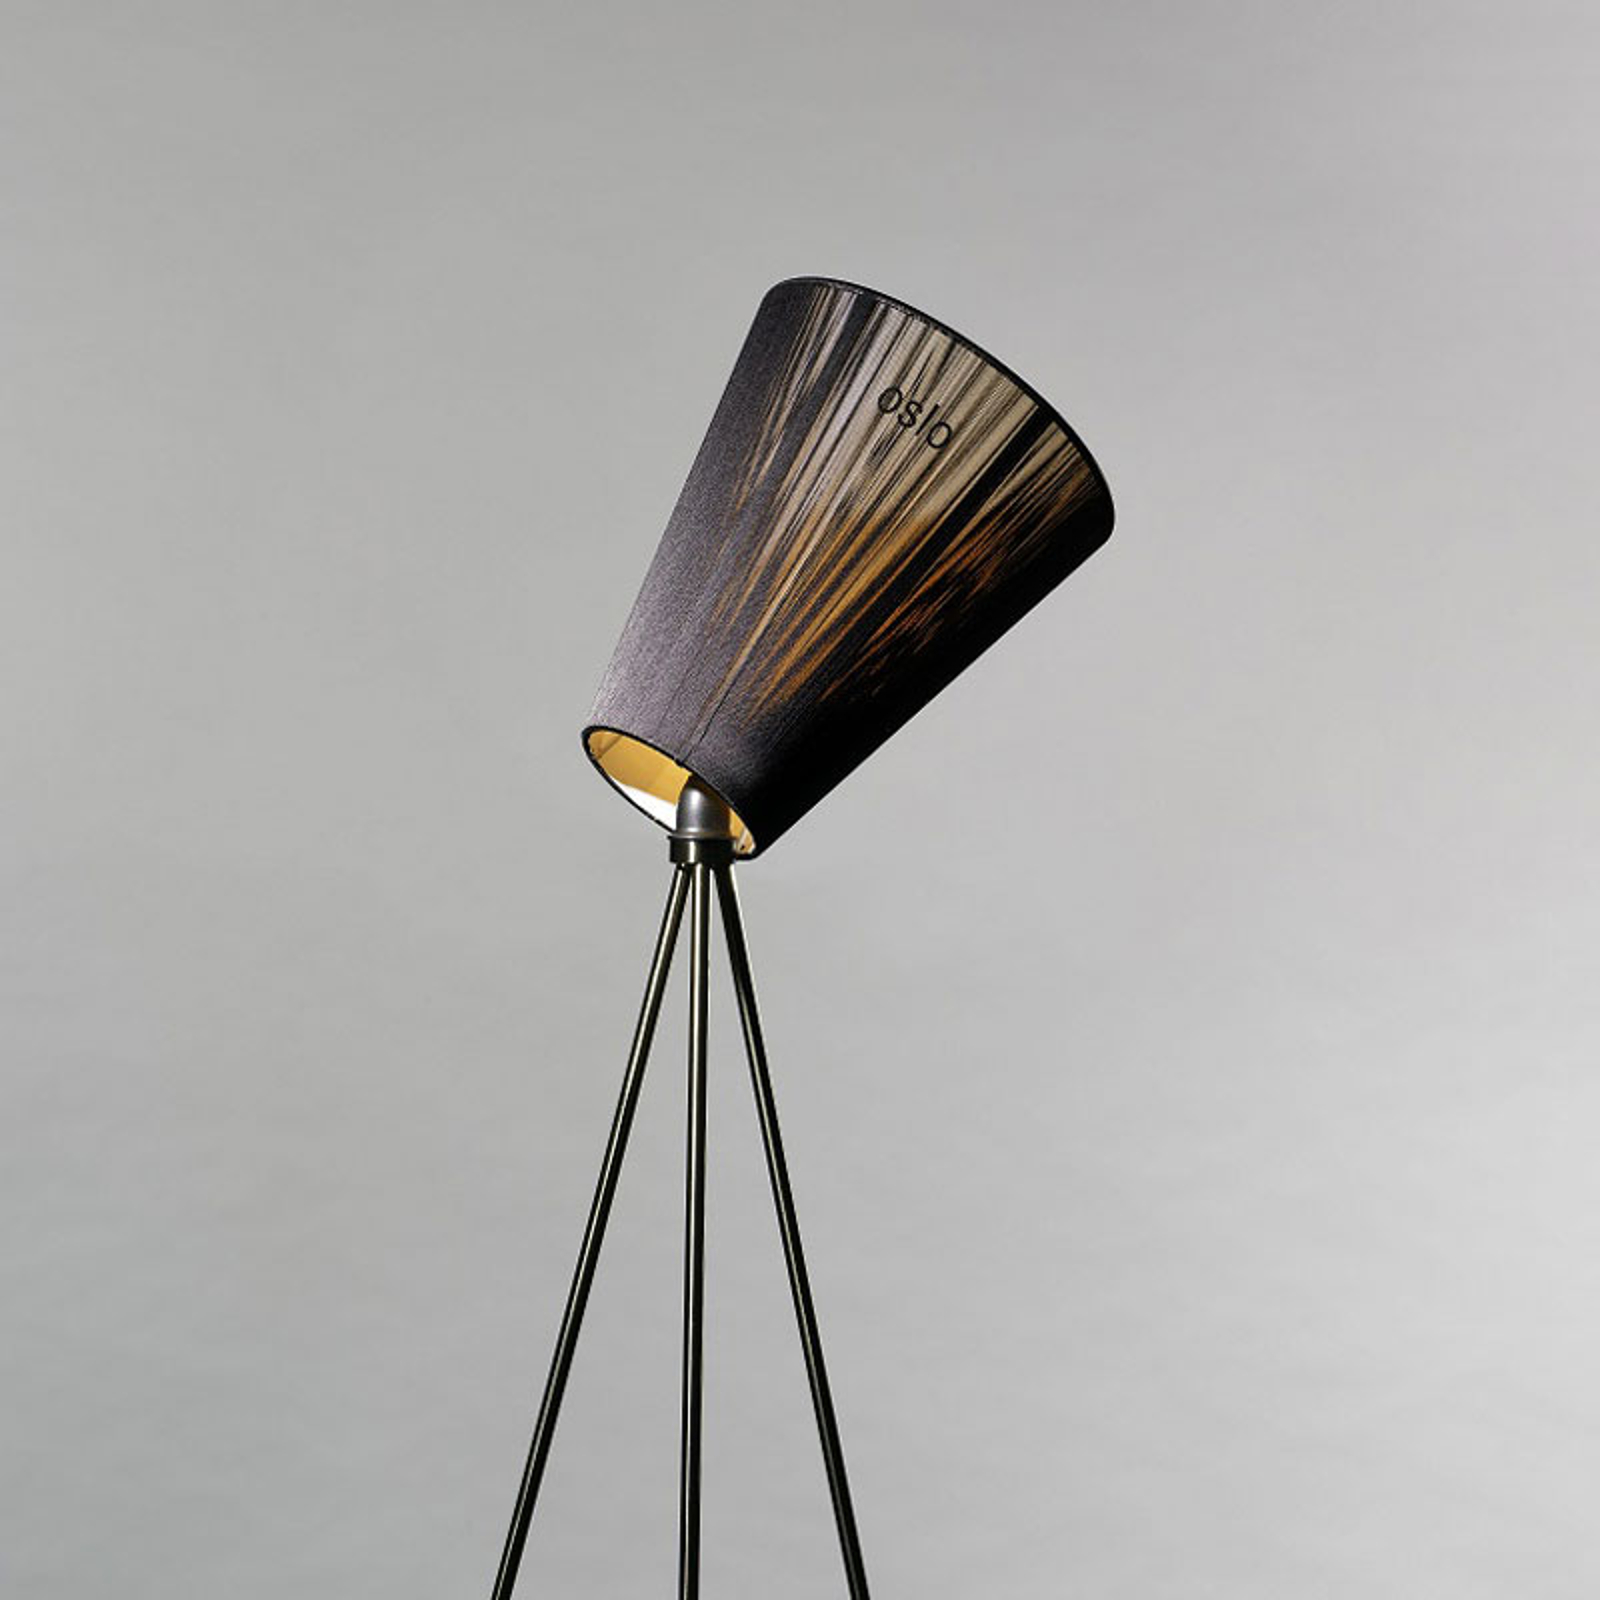 Northern Oslo Wood gulvlampe, svart/svart